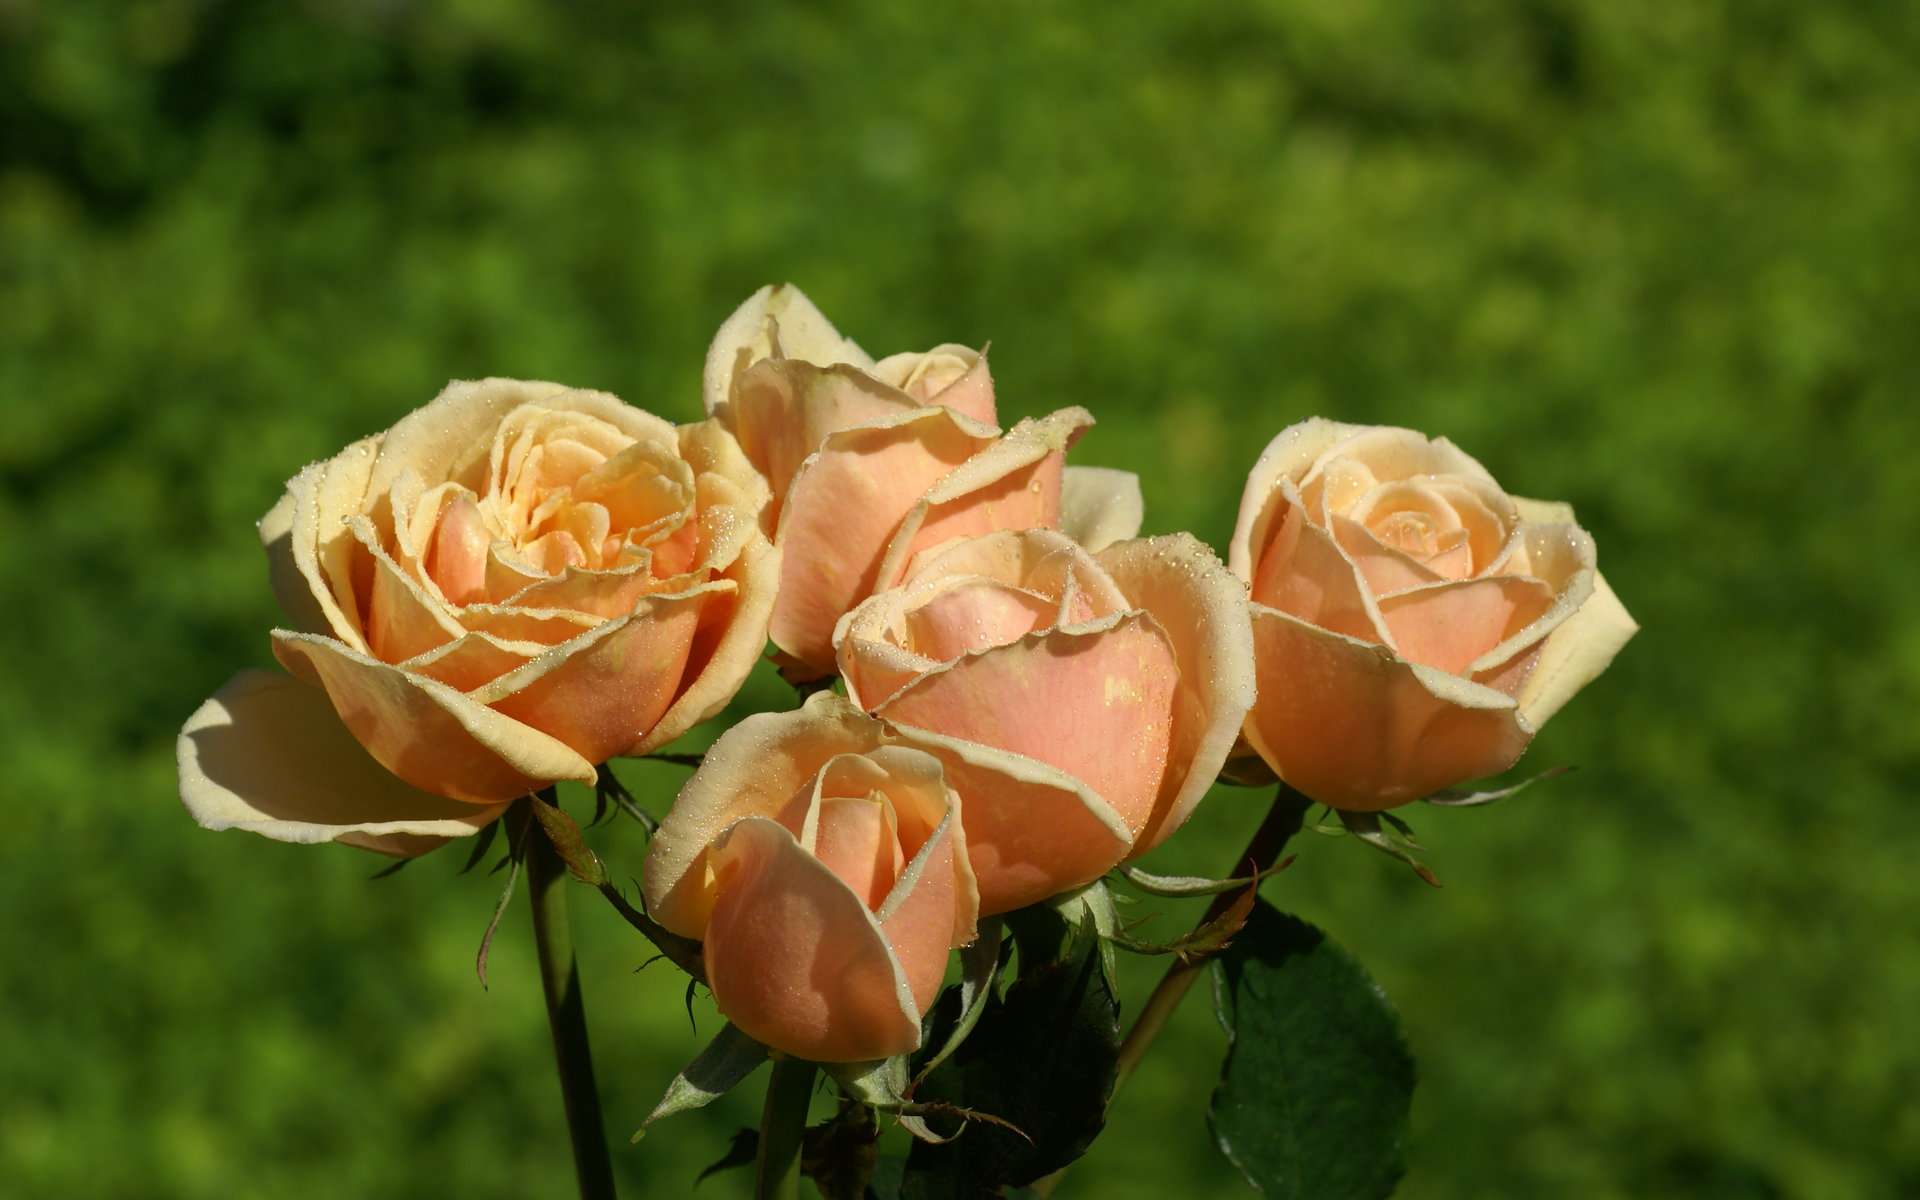 Beautiful roses widescreen wallpapers - Peach rose wallpaper ...